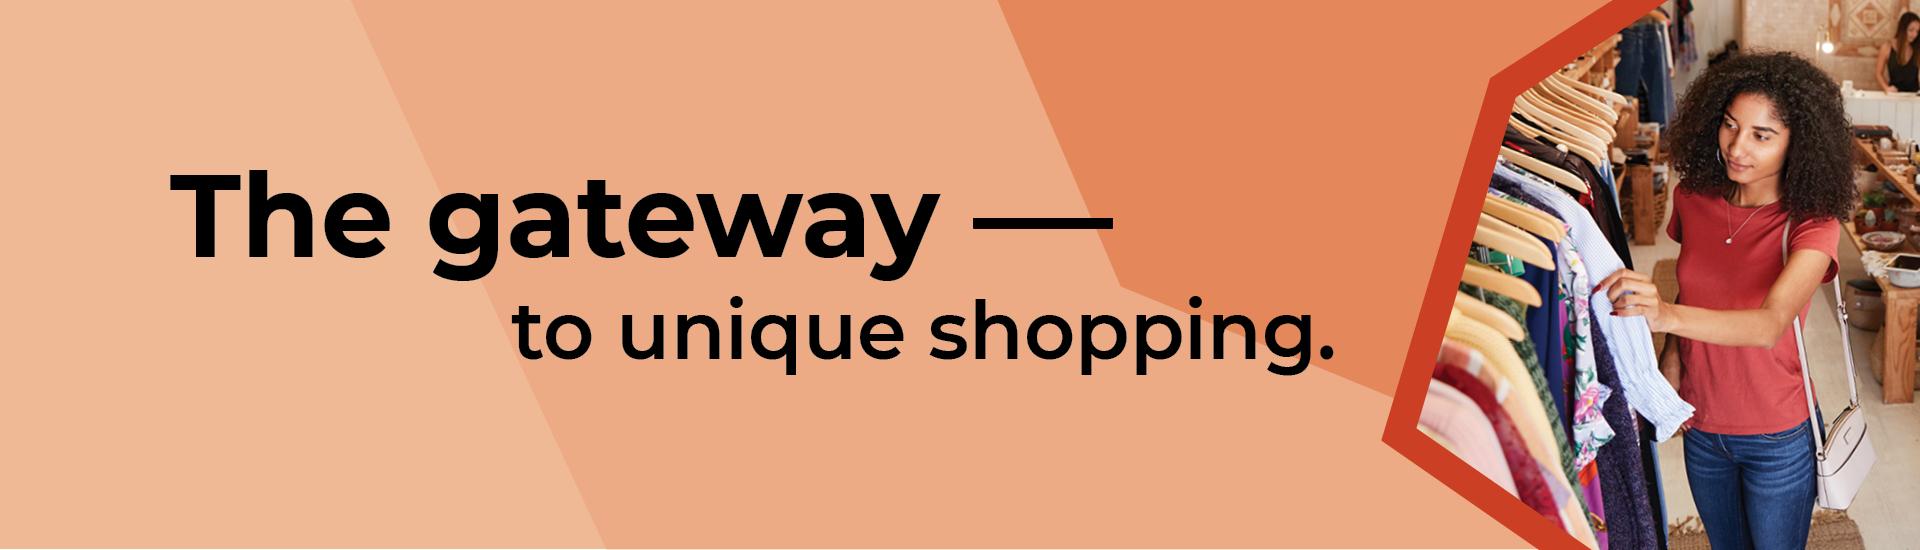 gateway-experience-shopping-hero2